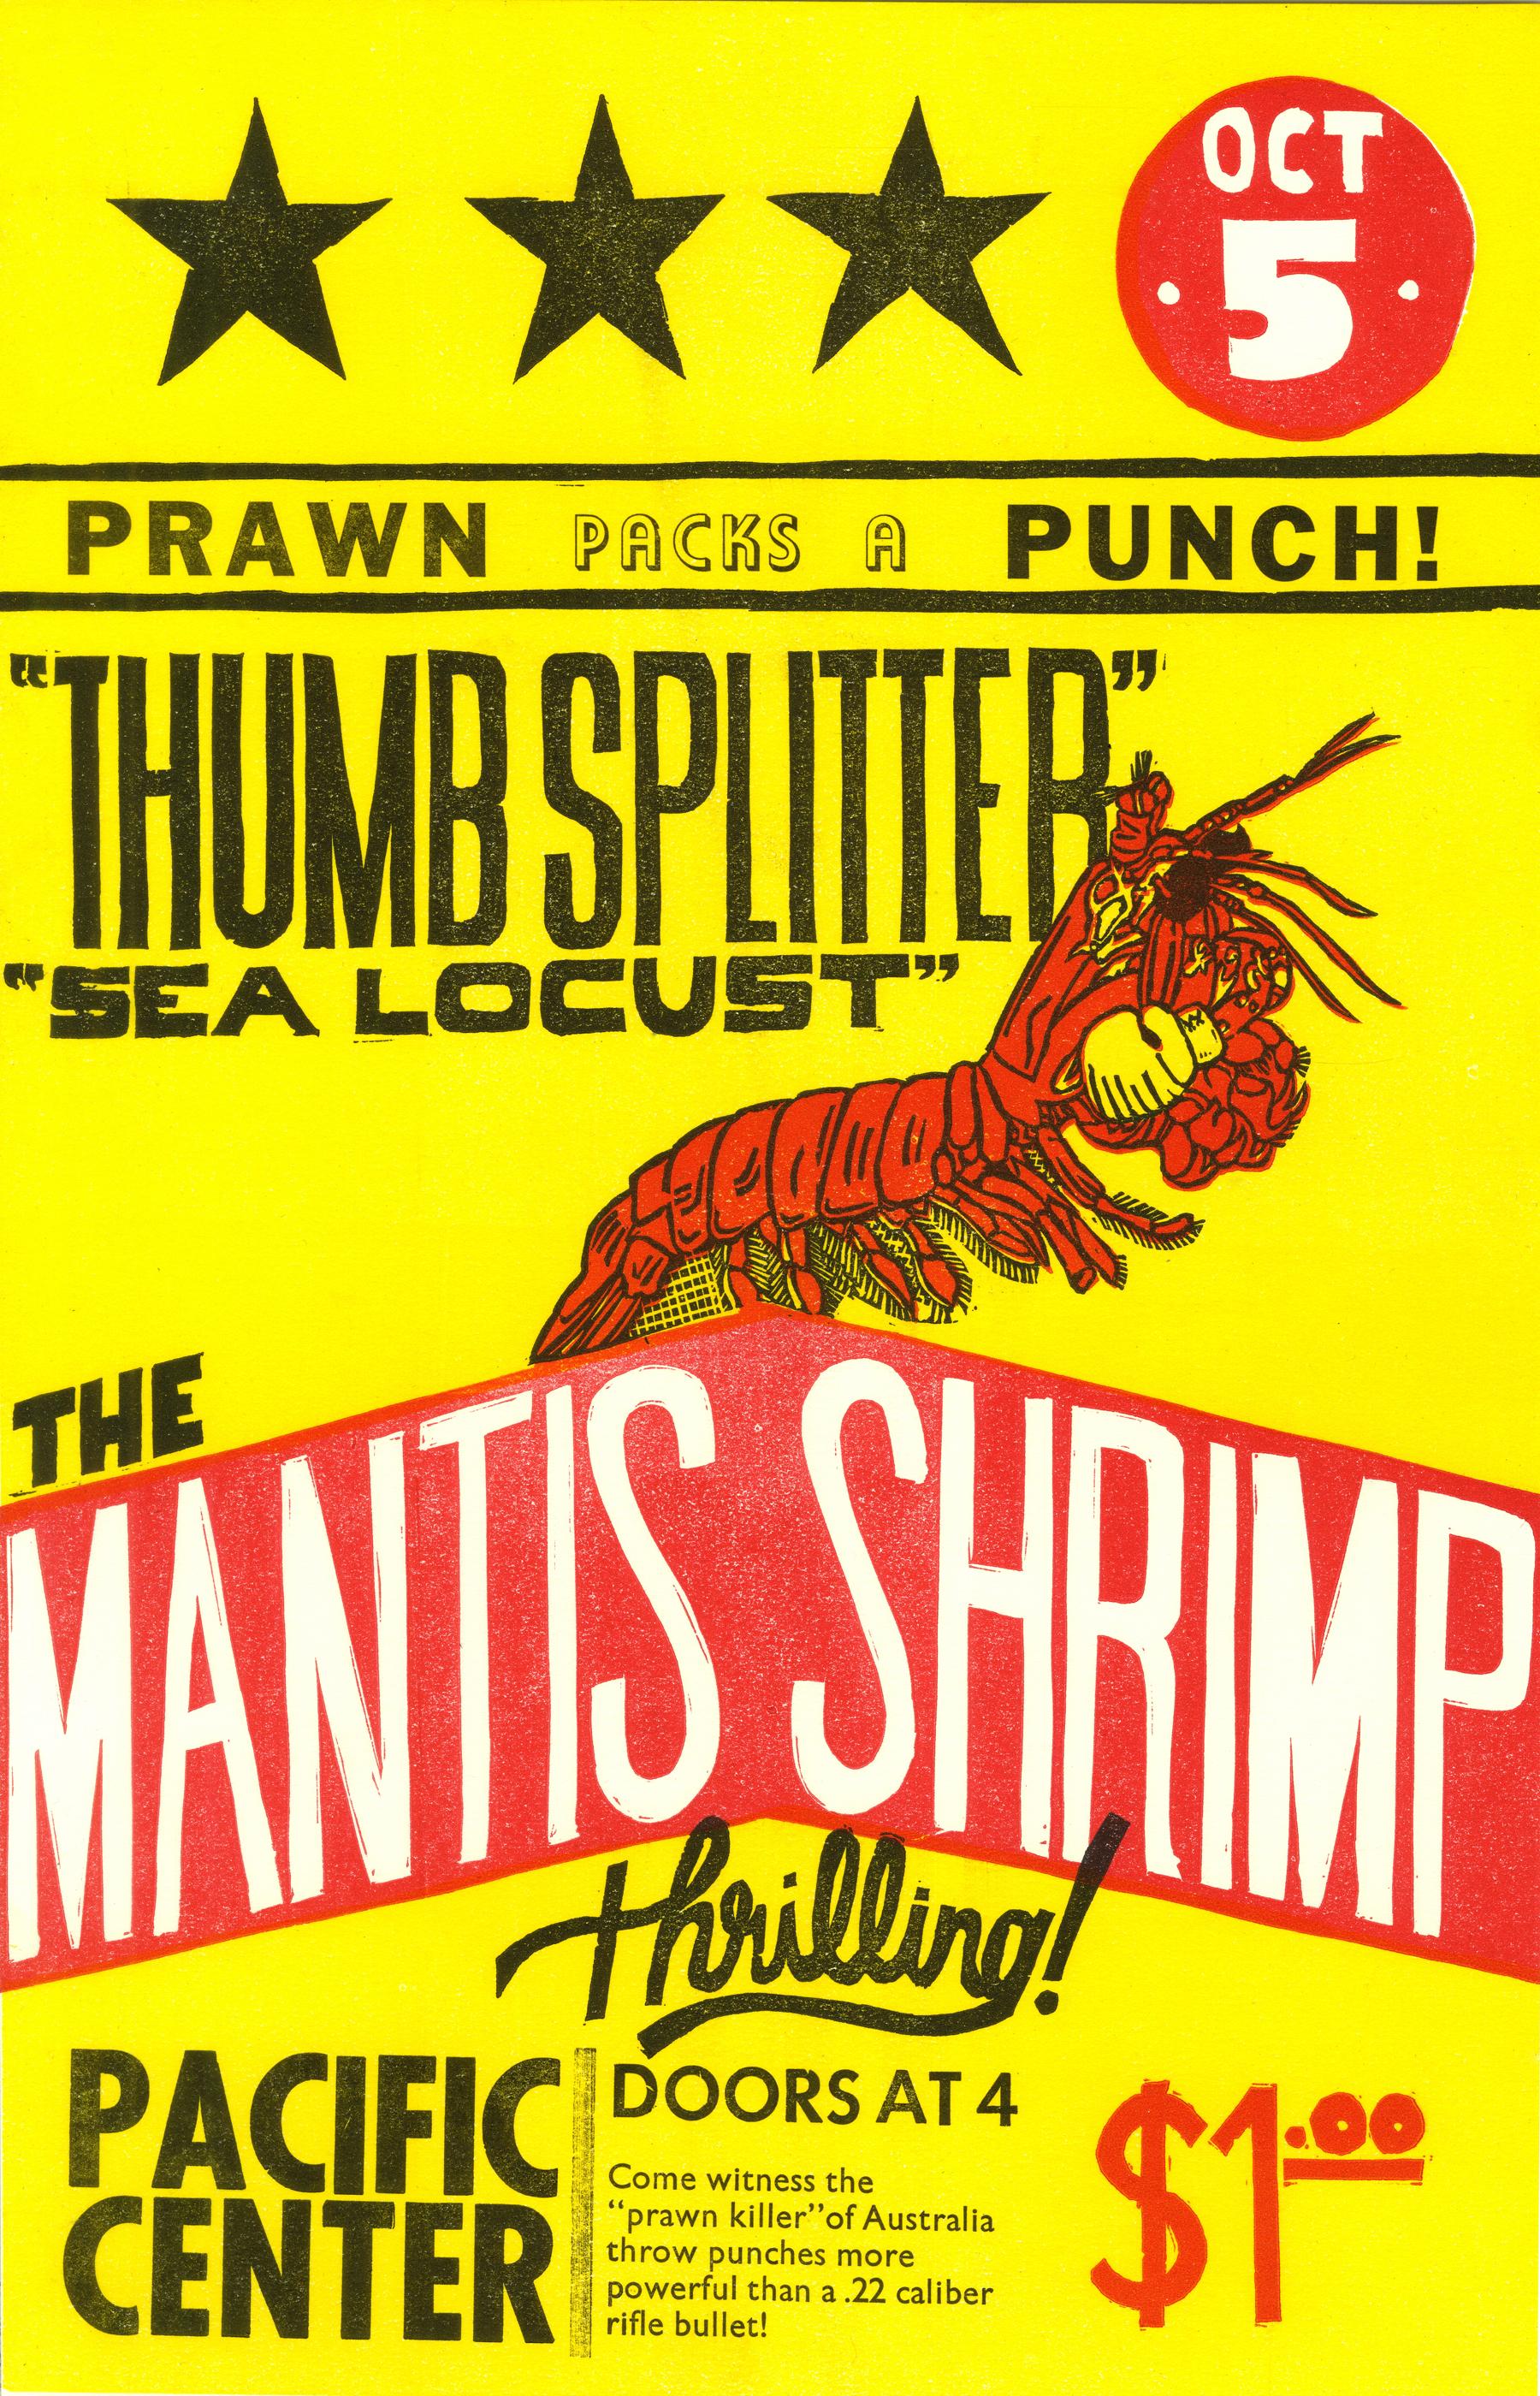 Mantis Champ